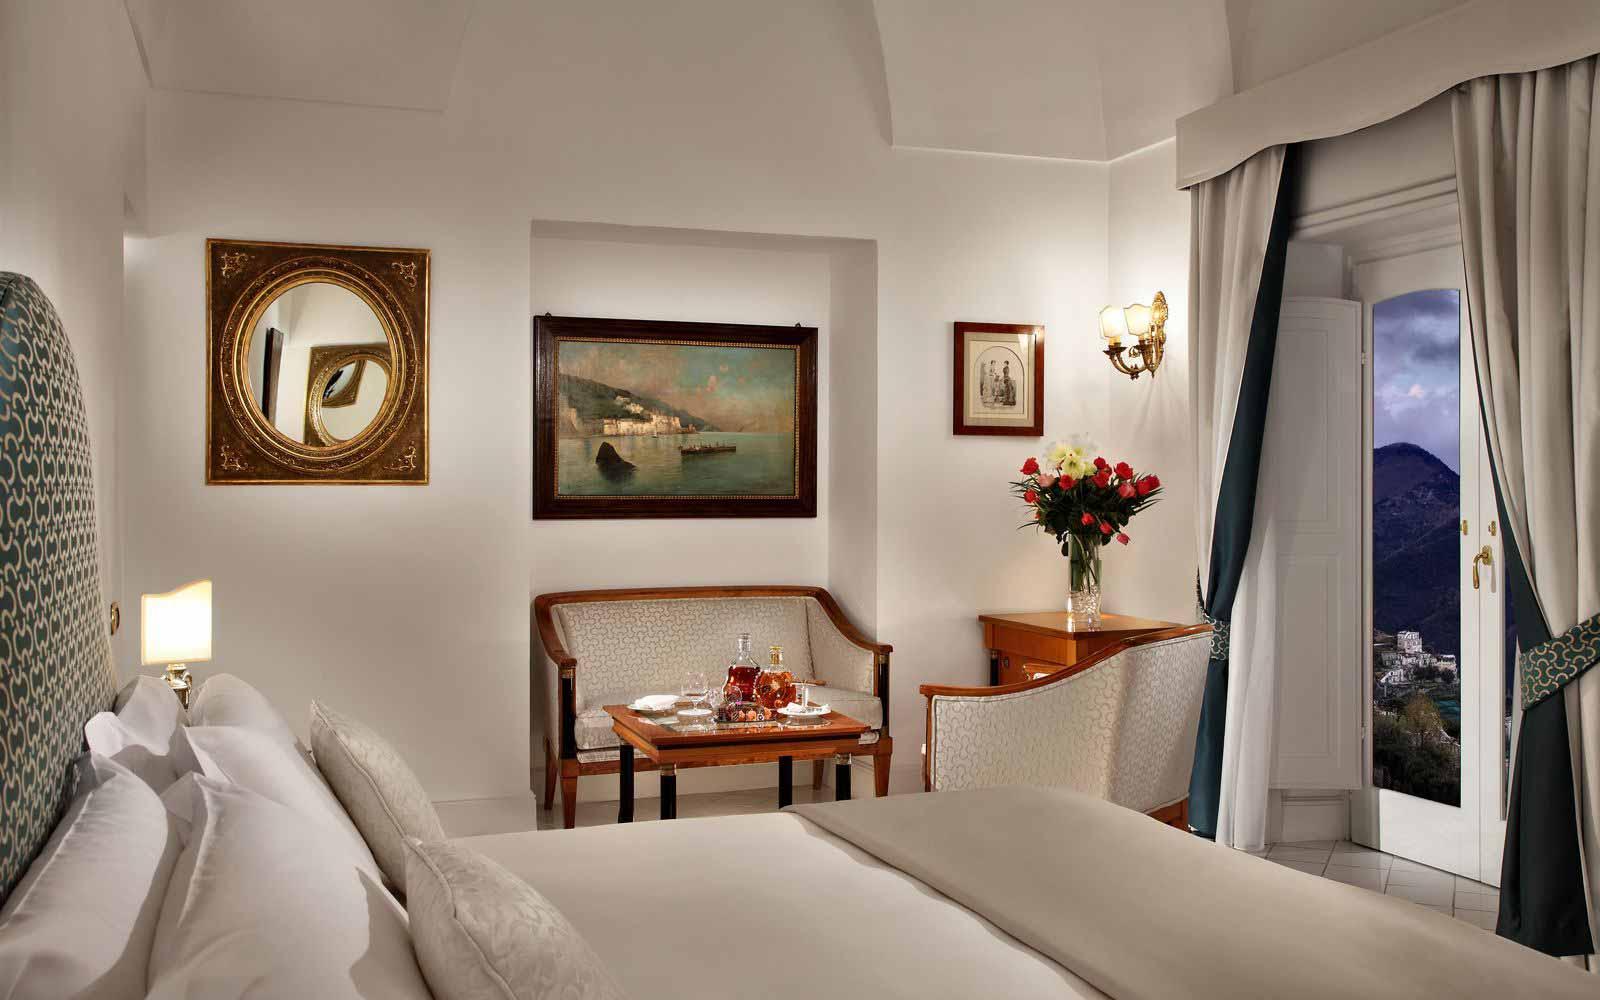 Junior Suite Room at Palazzo Avino